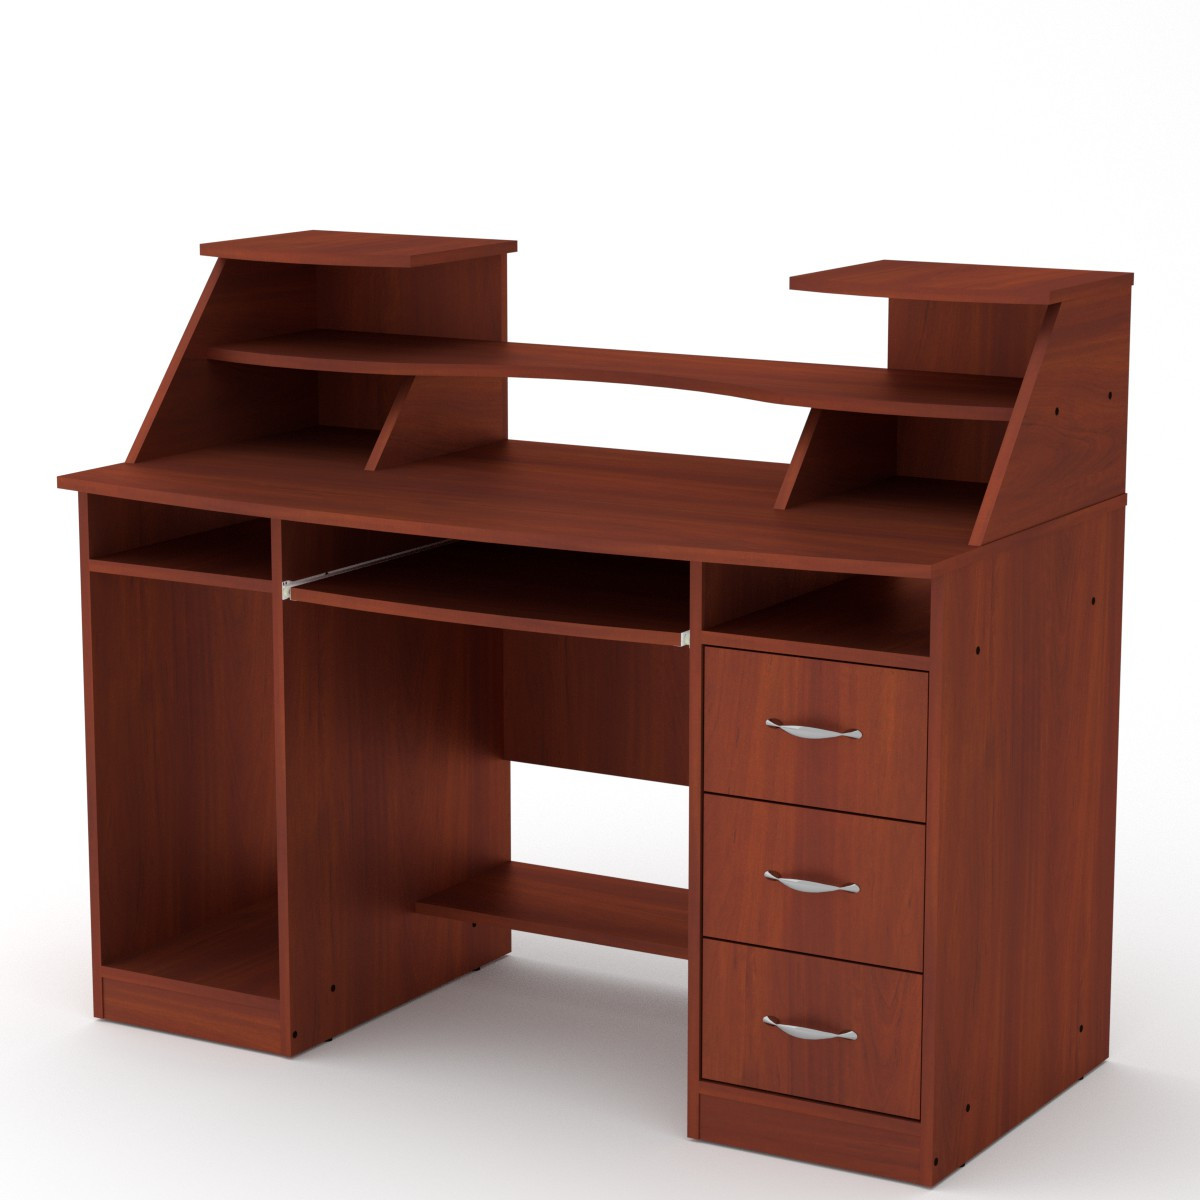 Стол компьютерный Комфорт-5 яблоня Компанит (127х65х104 см)